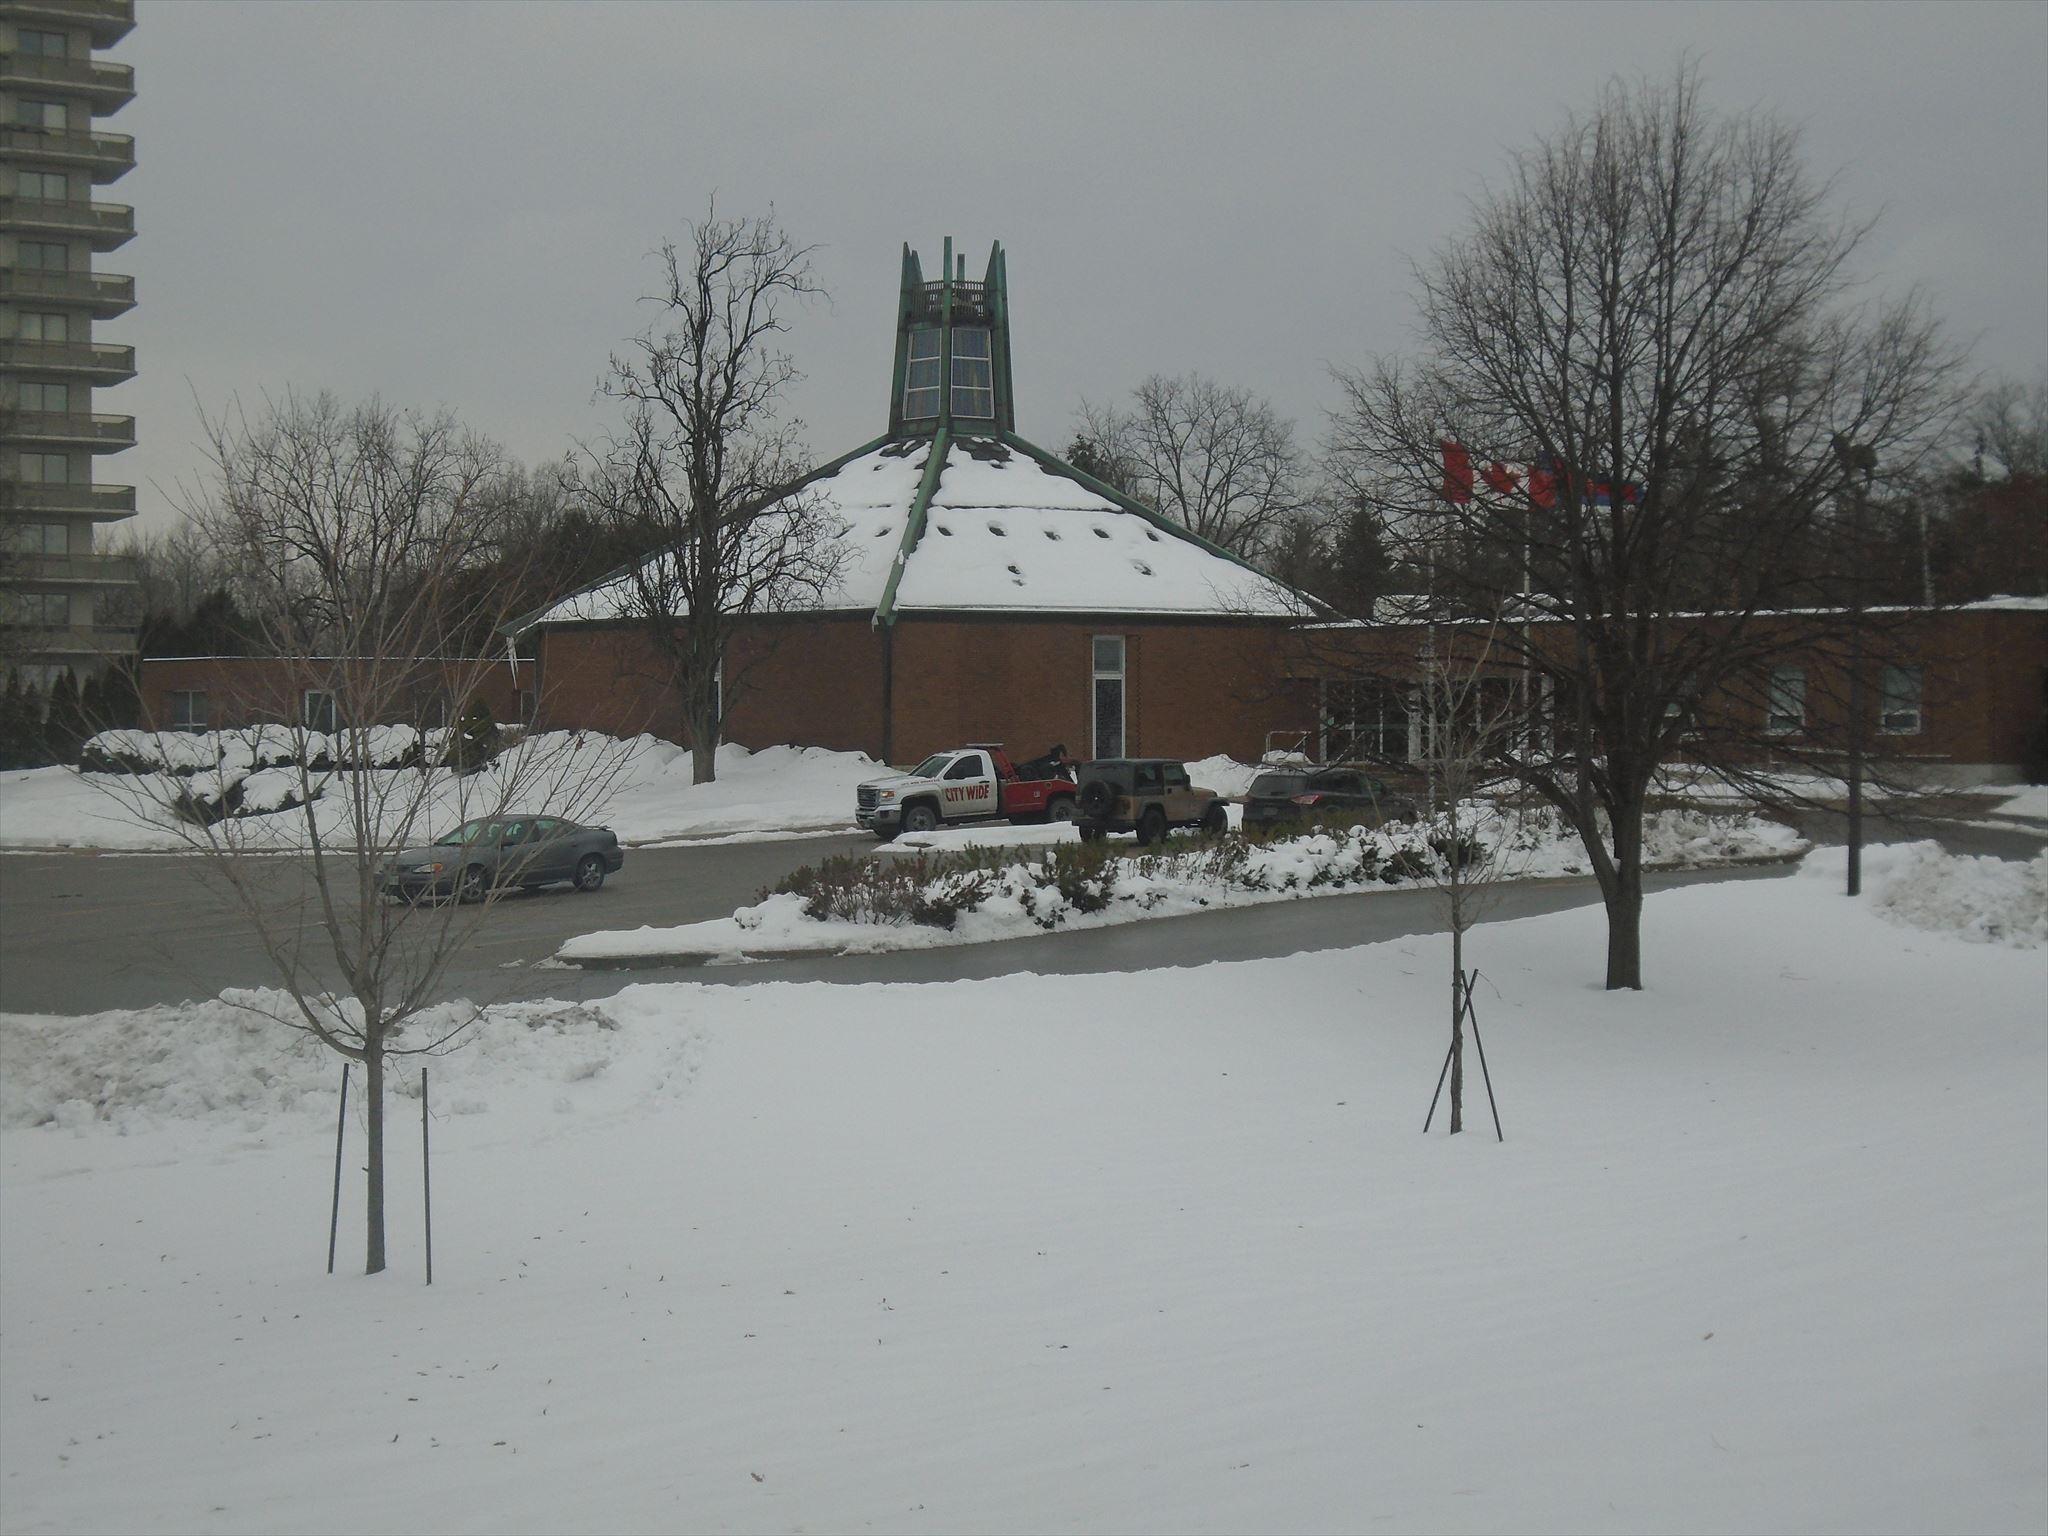 Salvation Army London Citadel Community Church - London, Ontario Image